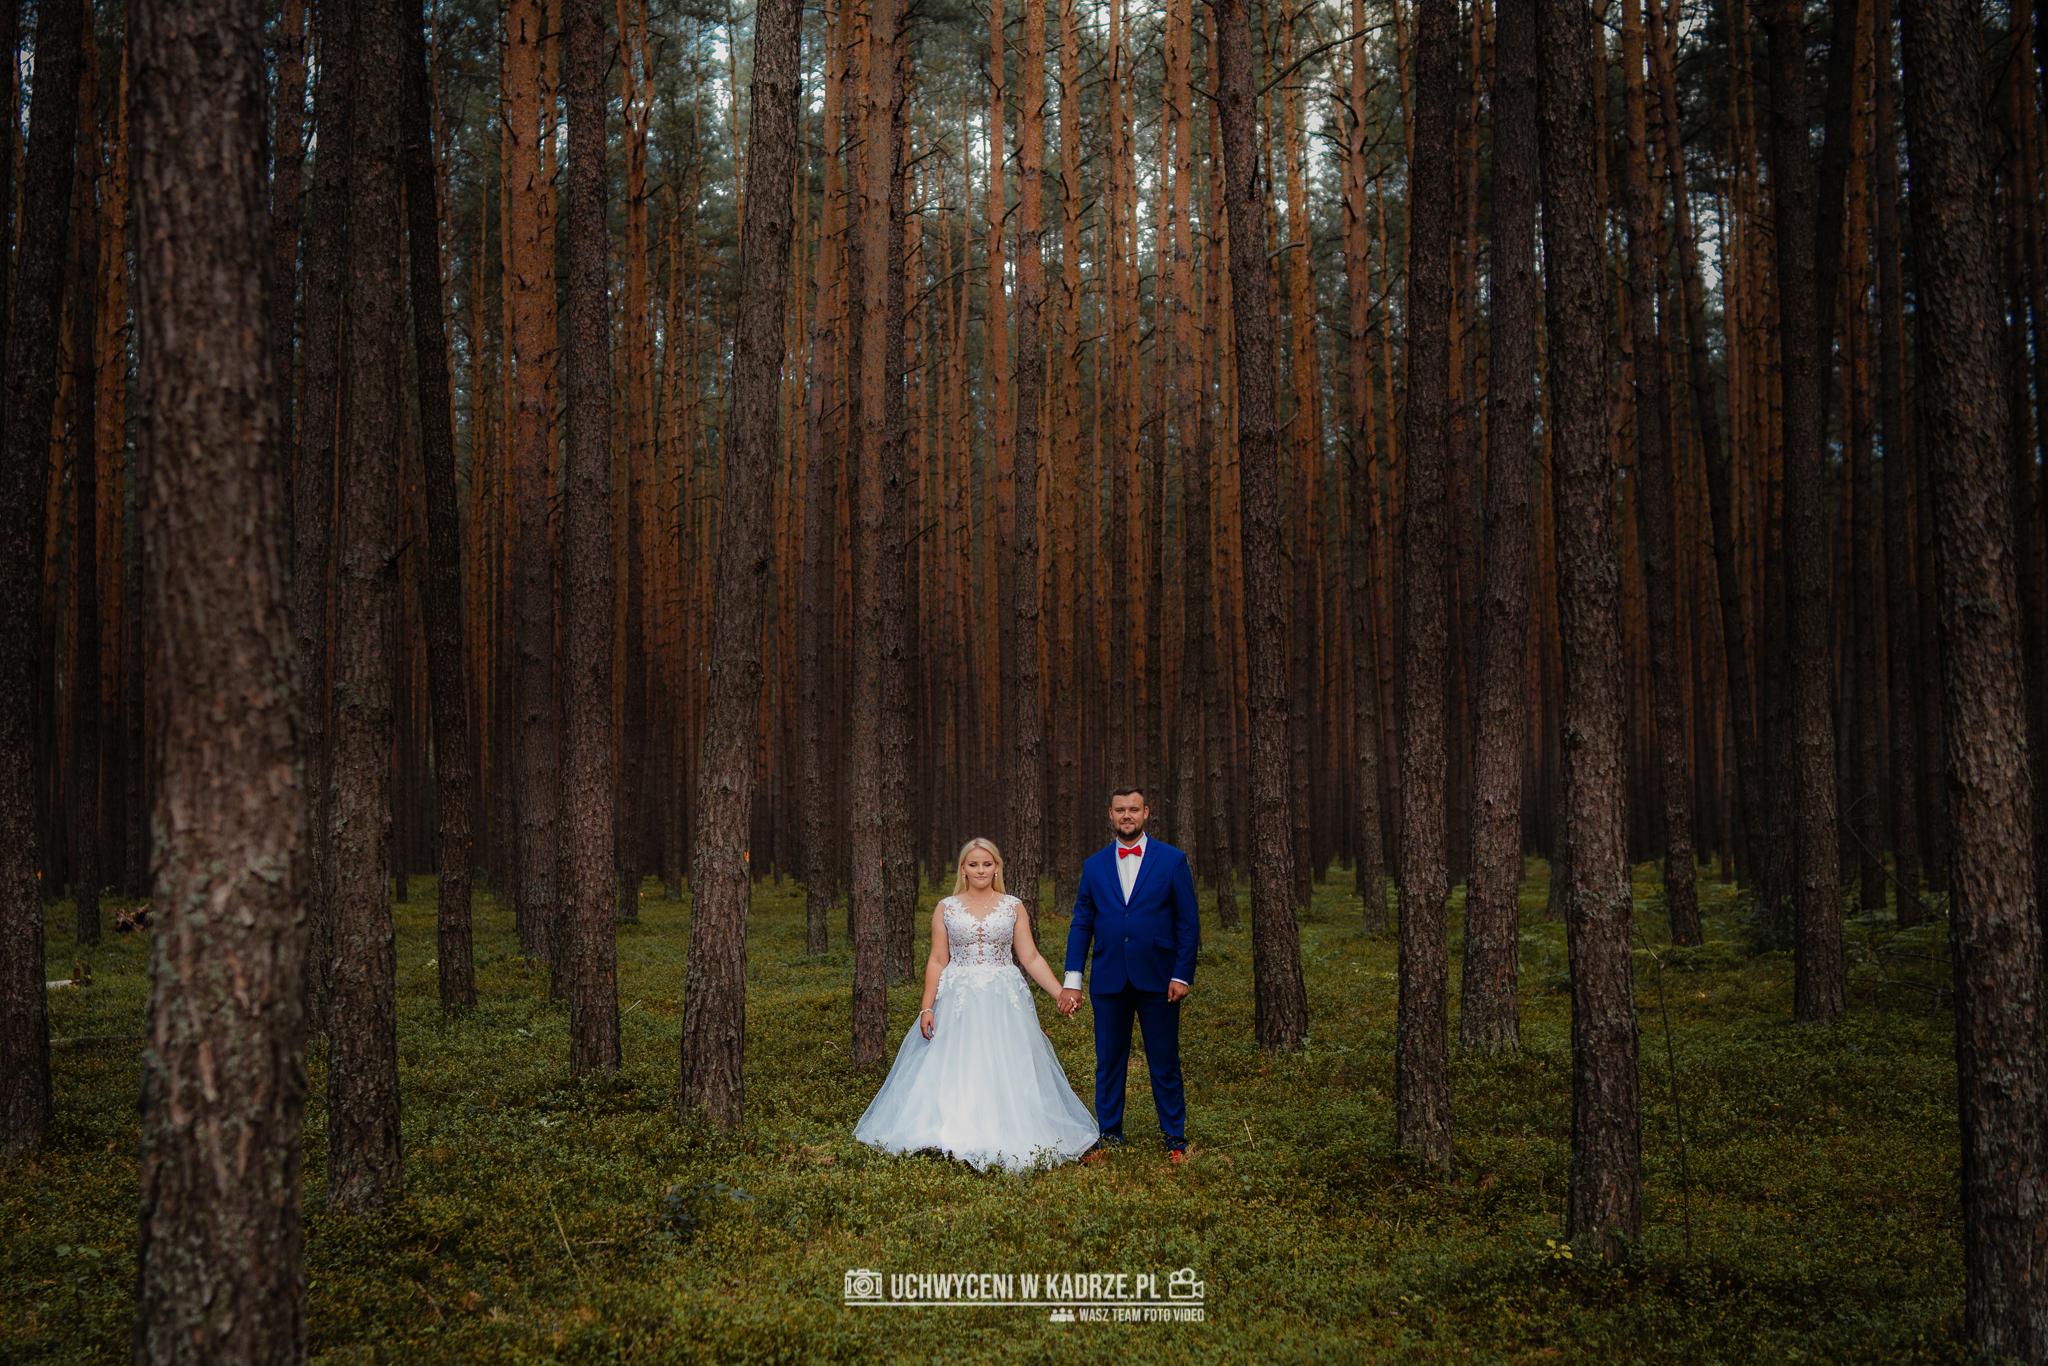 Justyna & Konrad | Sesja plenerowa na Roztoczu